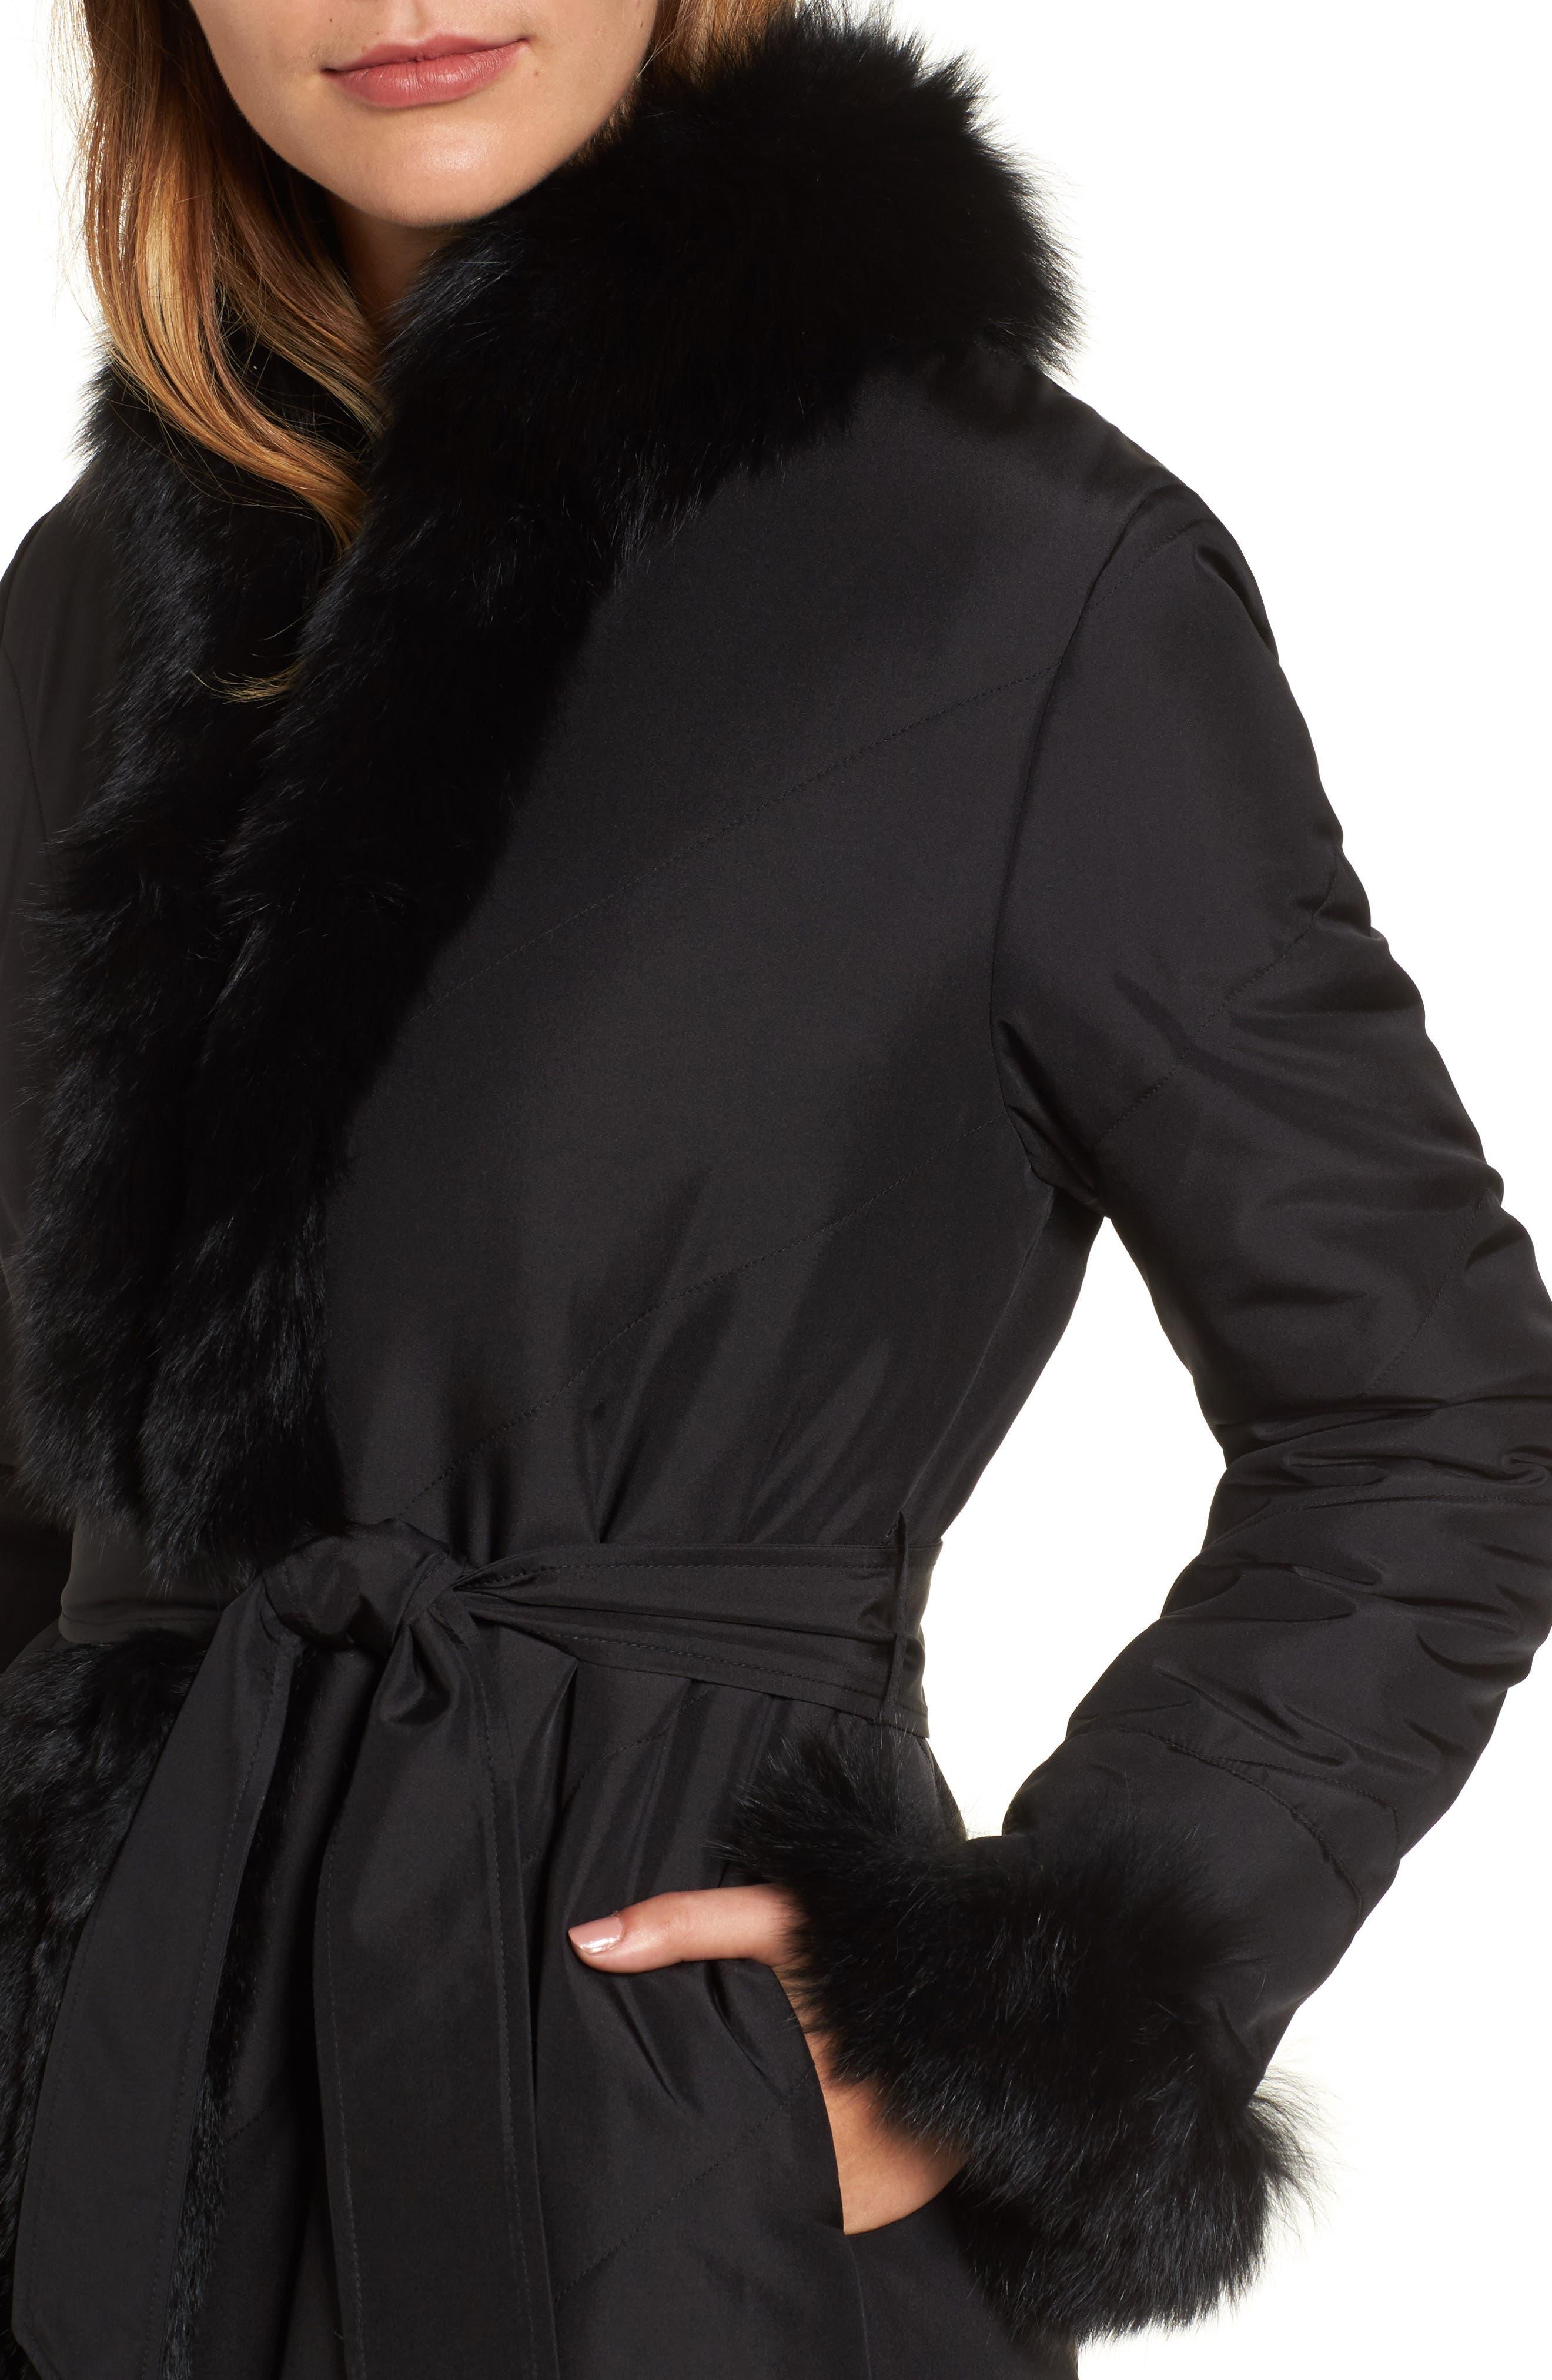 Couture Packable Silk Coat with Genuine Fox Fur & Genuine Rabbit Fur,                             Alternate thumbnail 7, color,